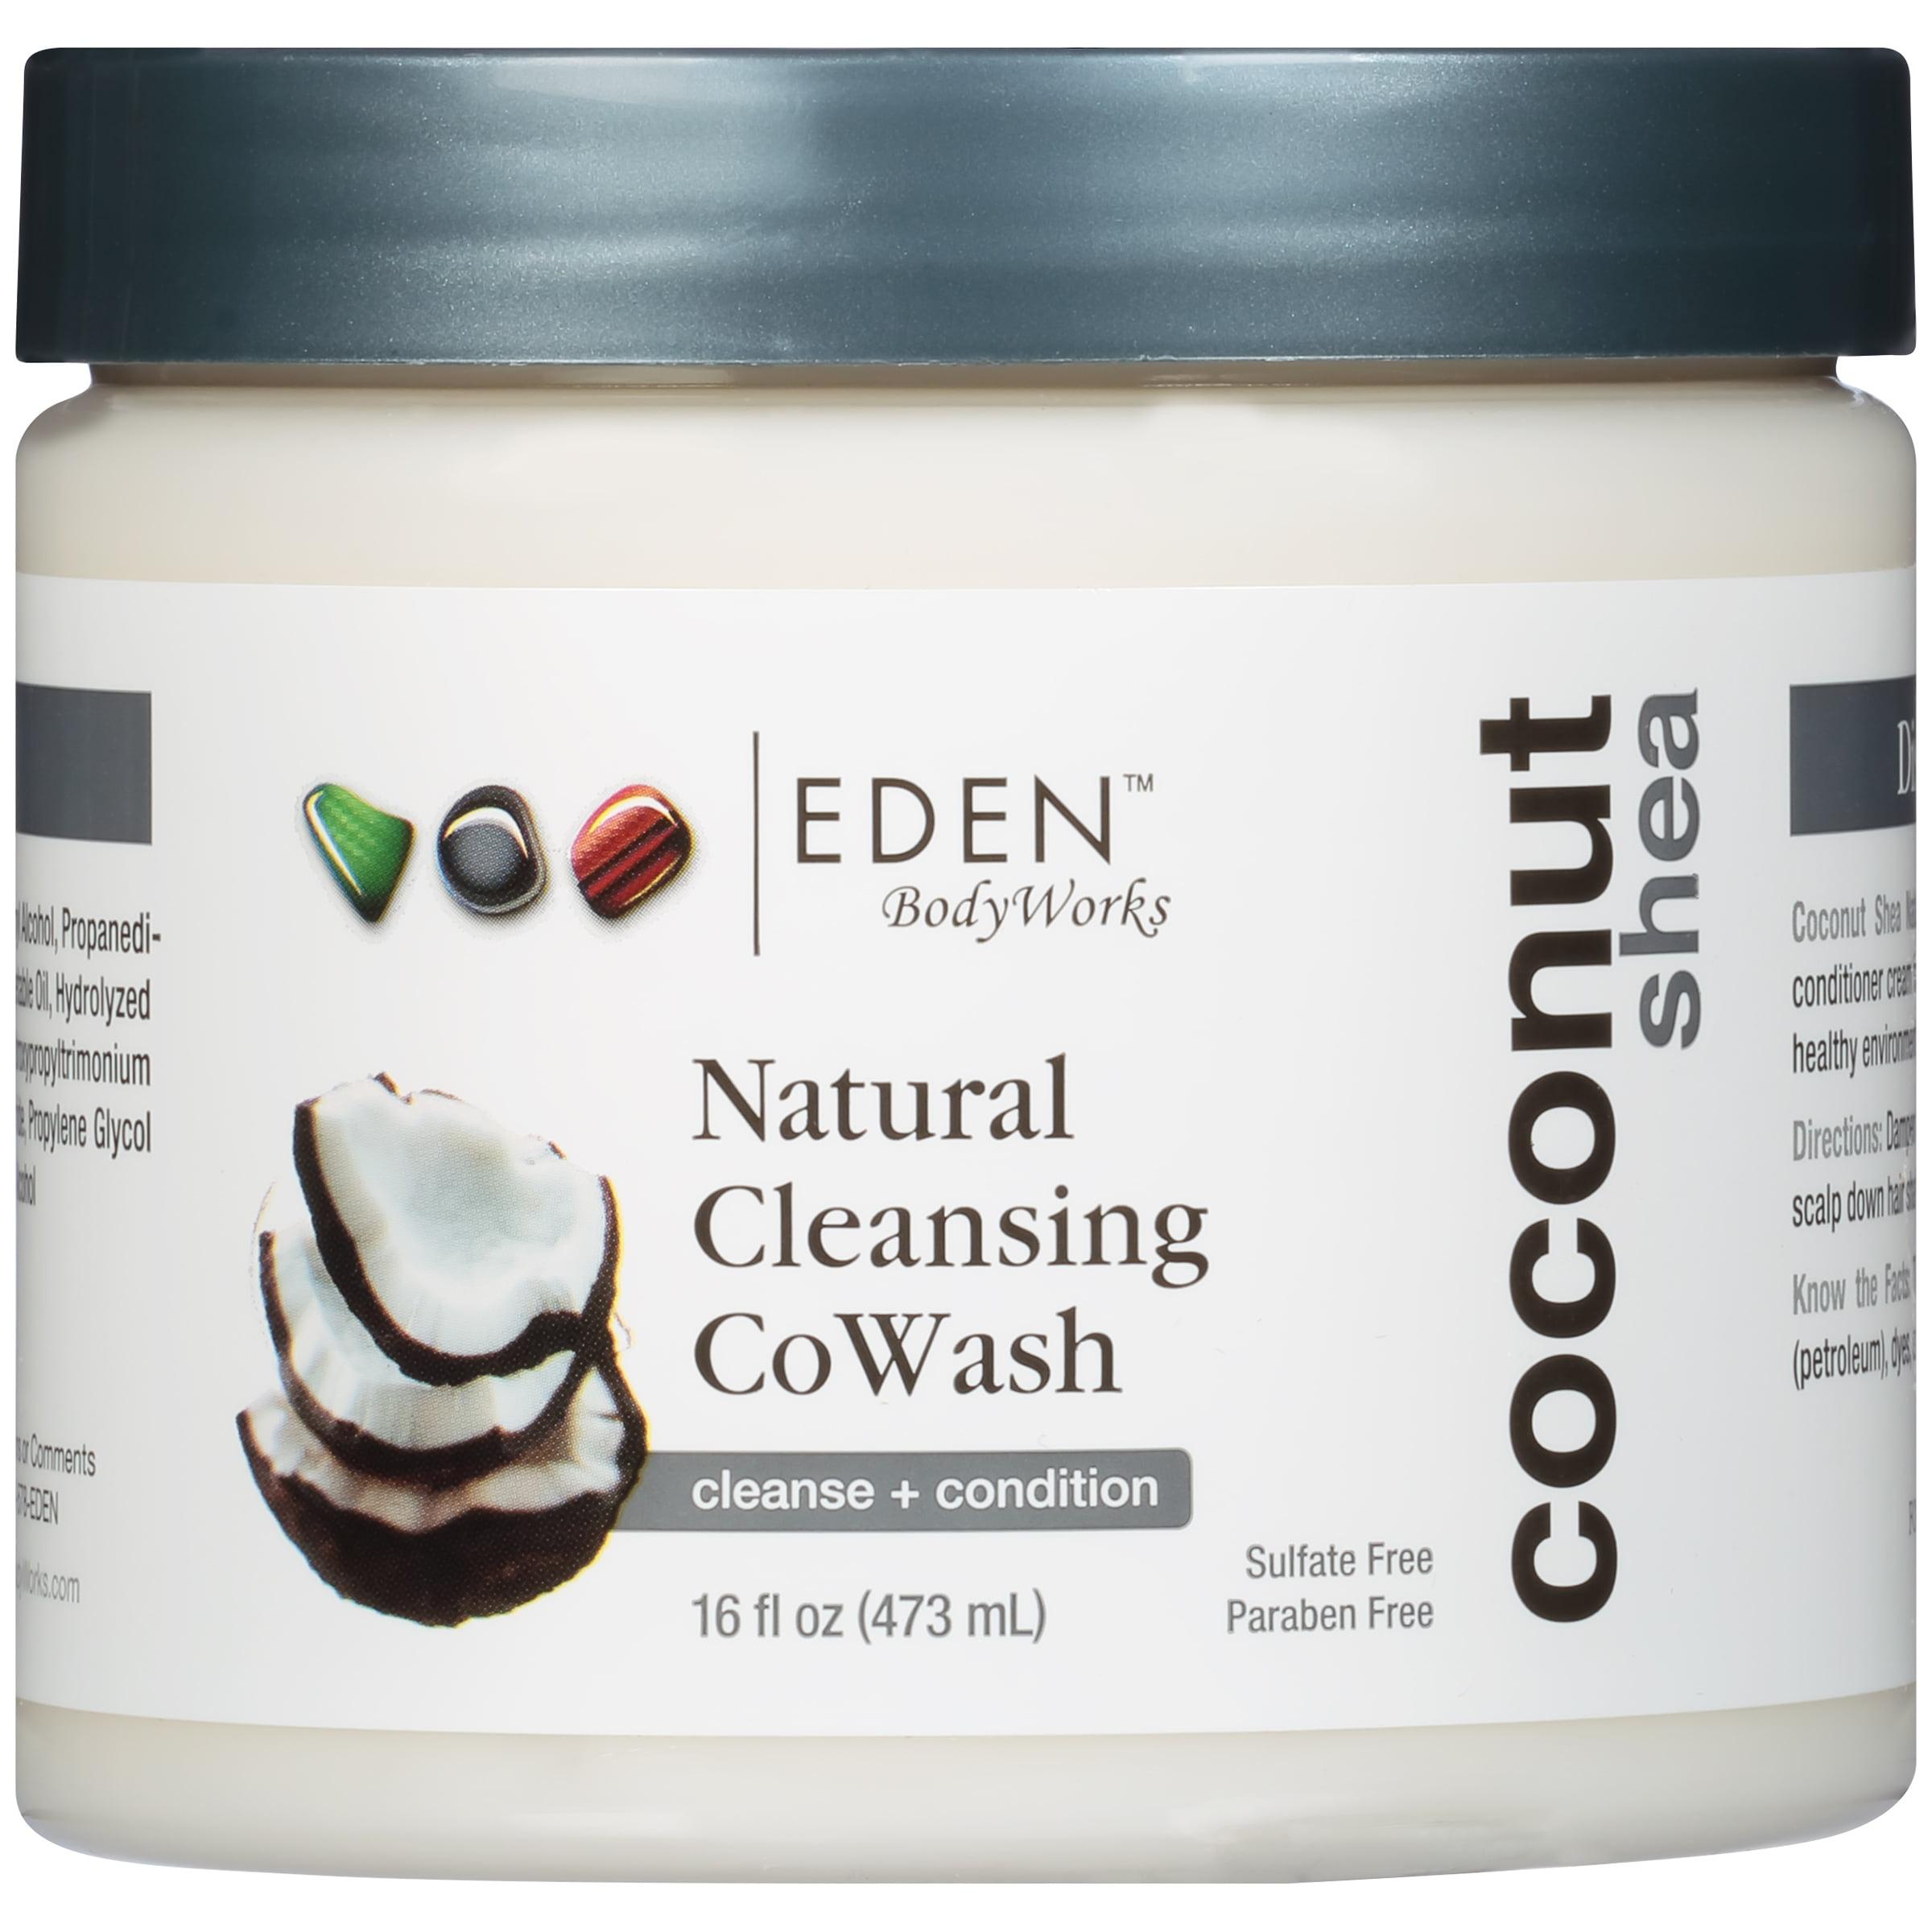 Eden™ Coconut Shea Natural Cleansing CoWash 16 fl. oz. Jar